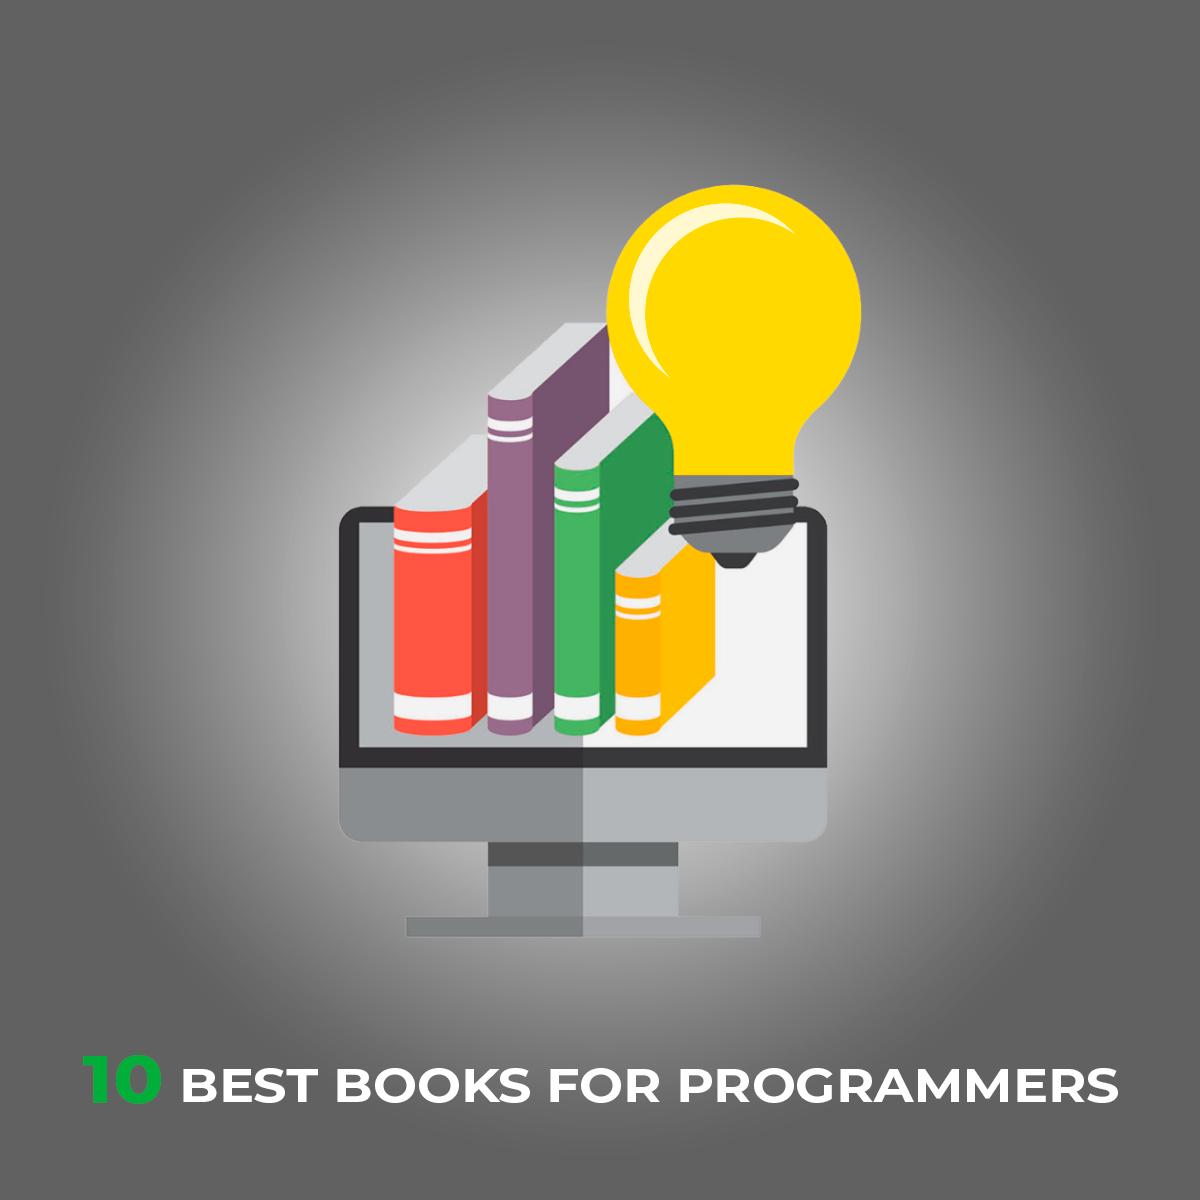 Top 10 basic books for developers